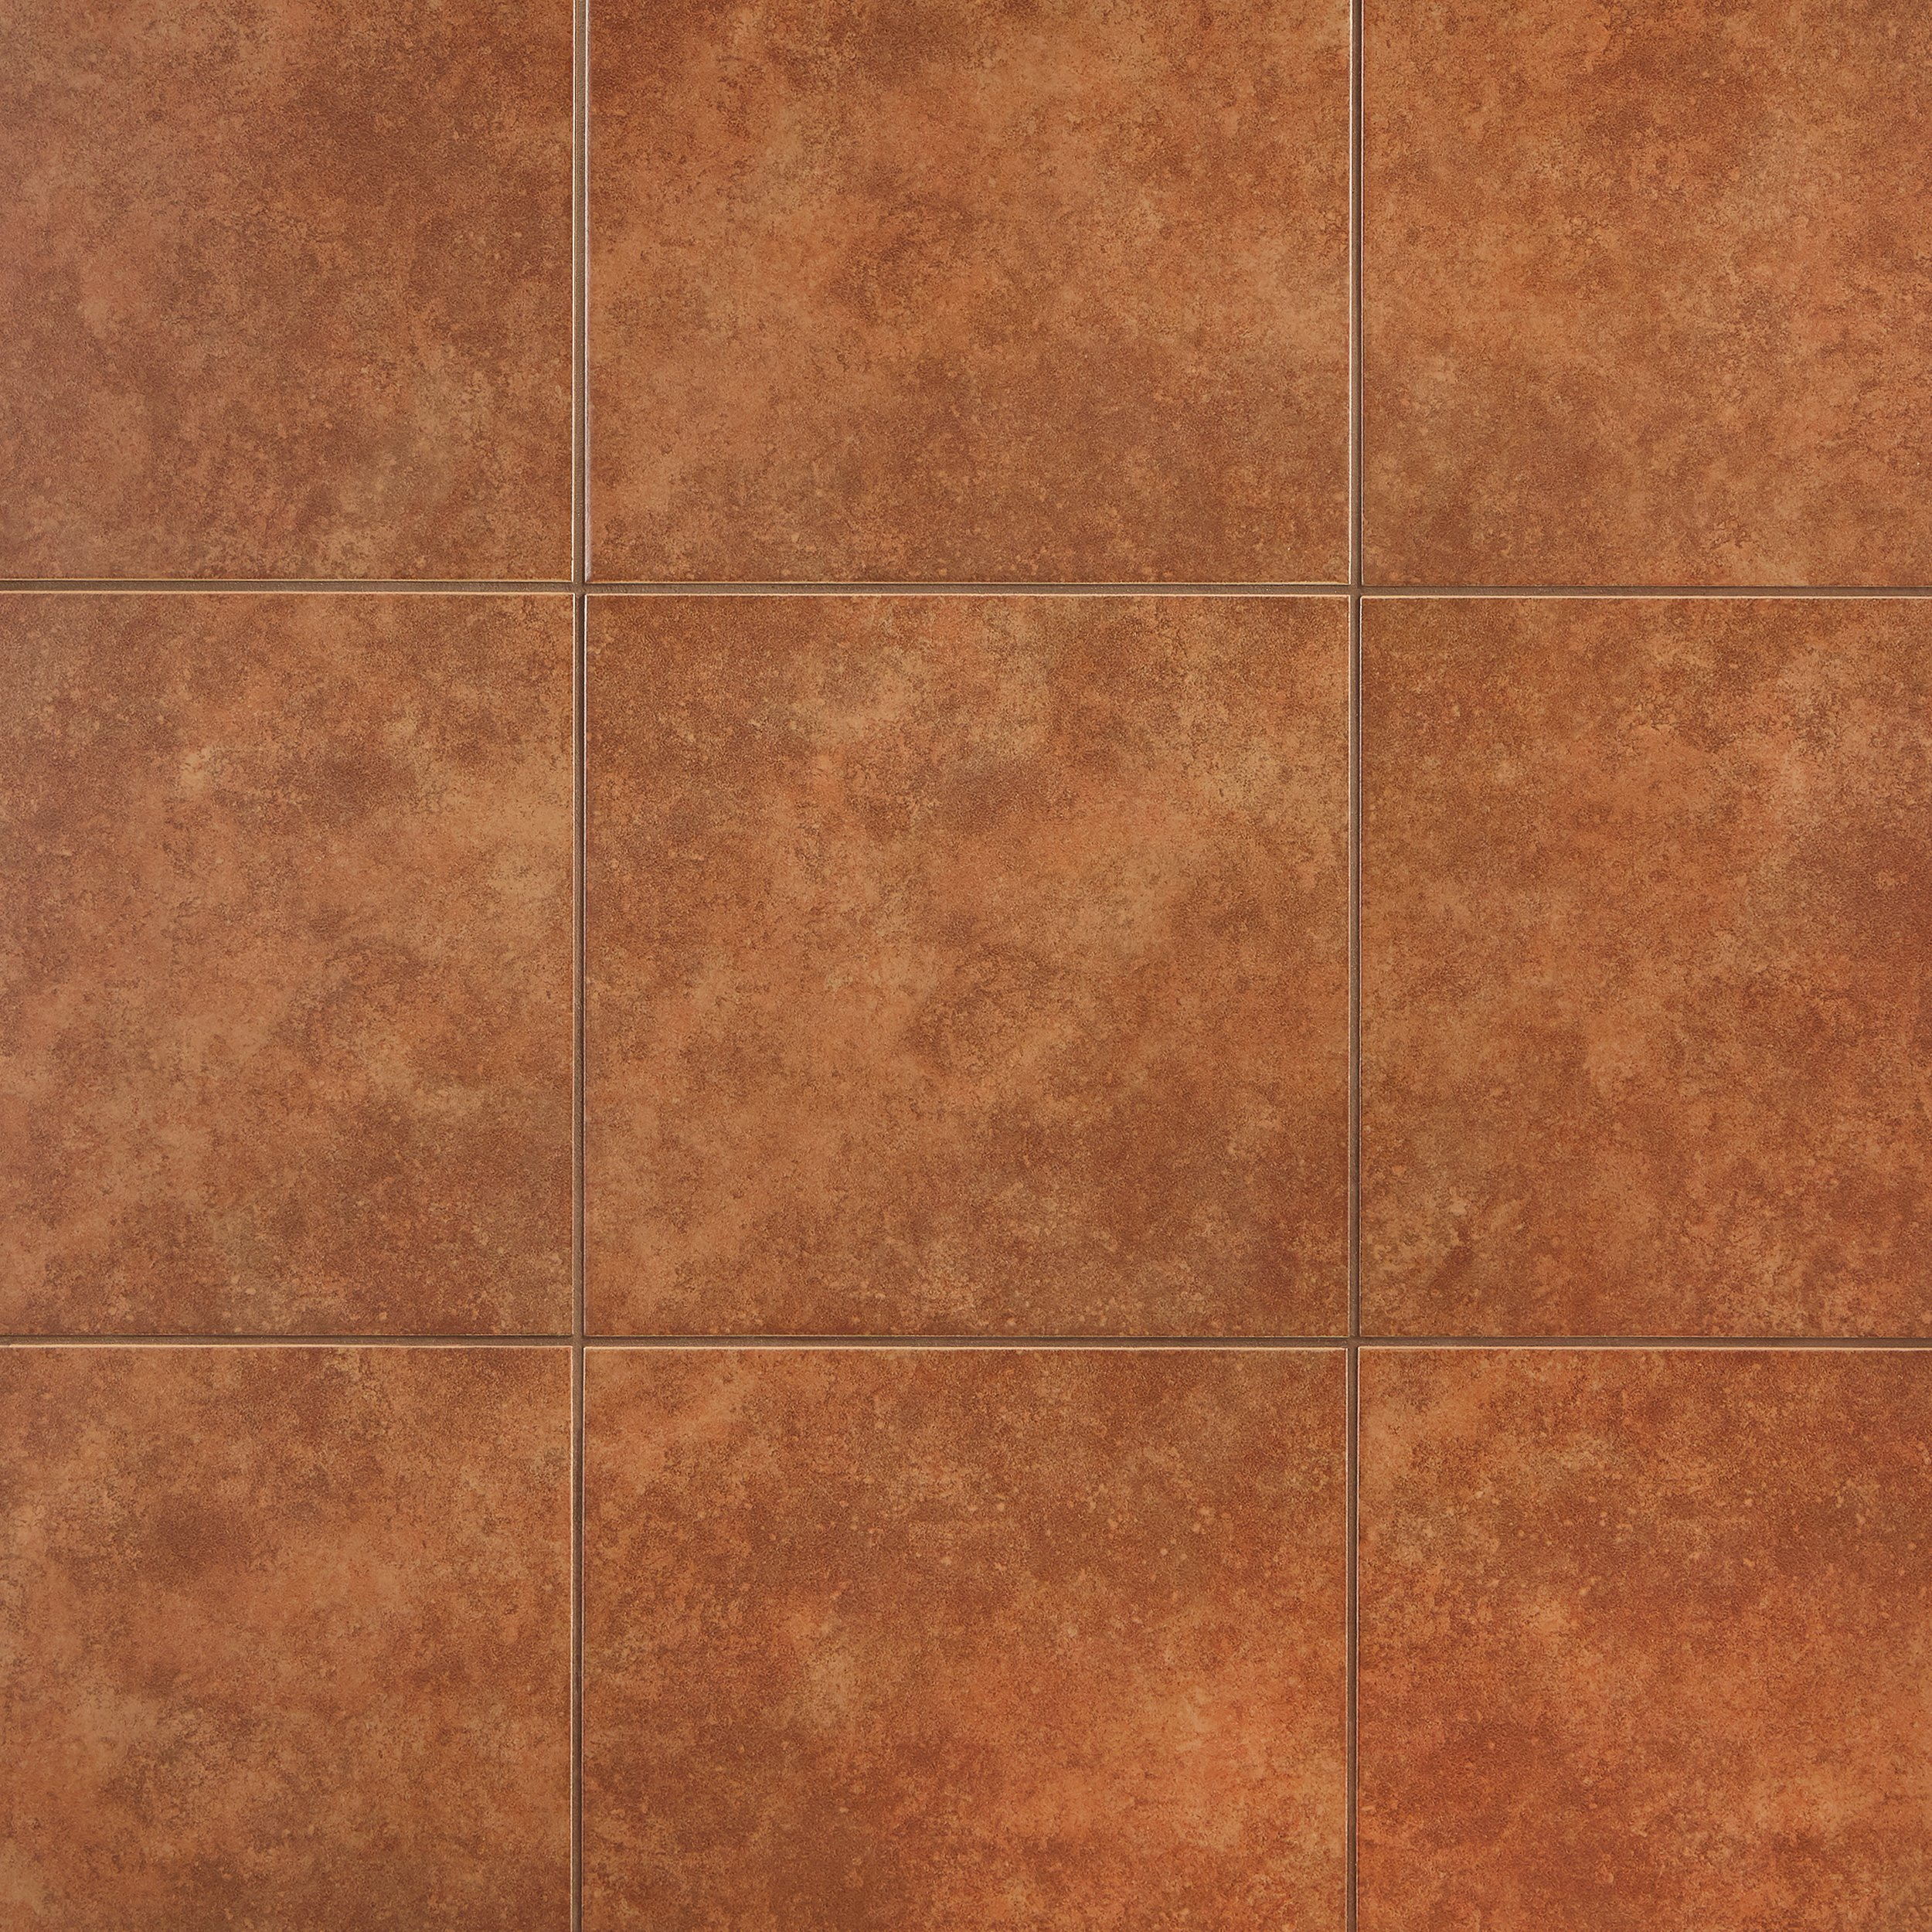 Fioro Cotto Ceramic Tile 13 X 13 911121499 Floor And Decor